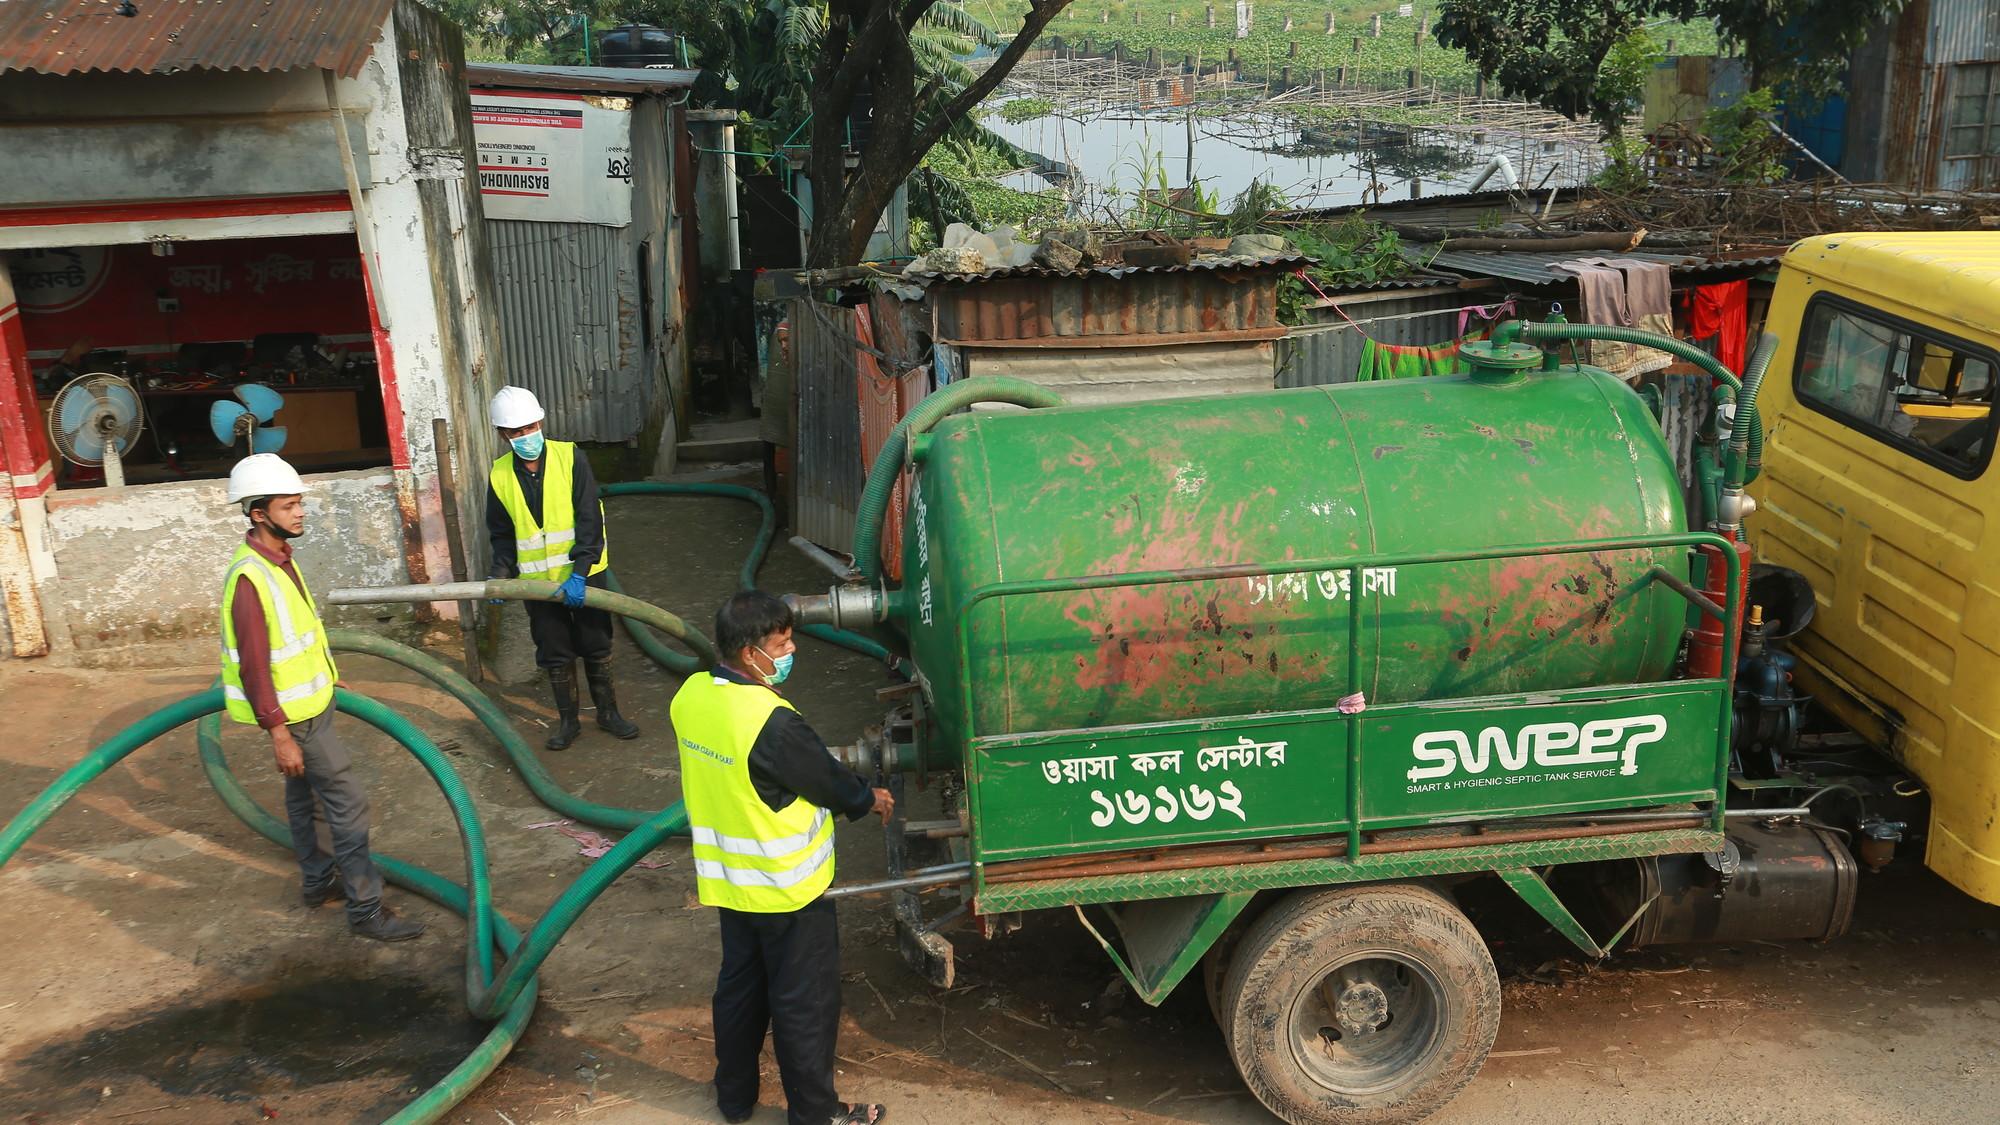 SWEEP vacuum tanker in Dhaka, Bangladesh